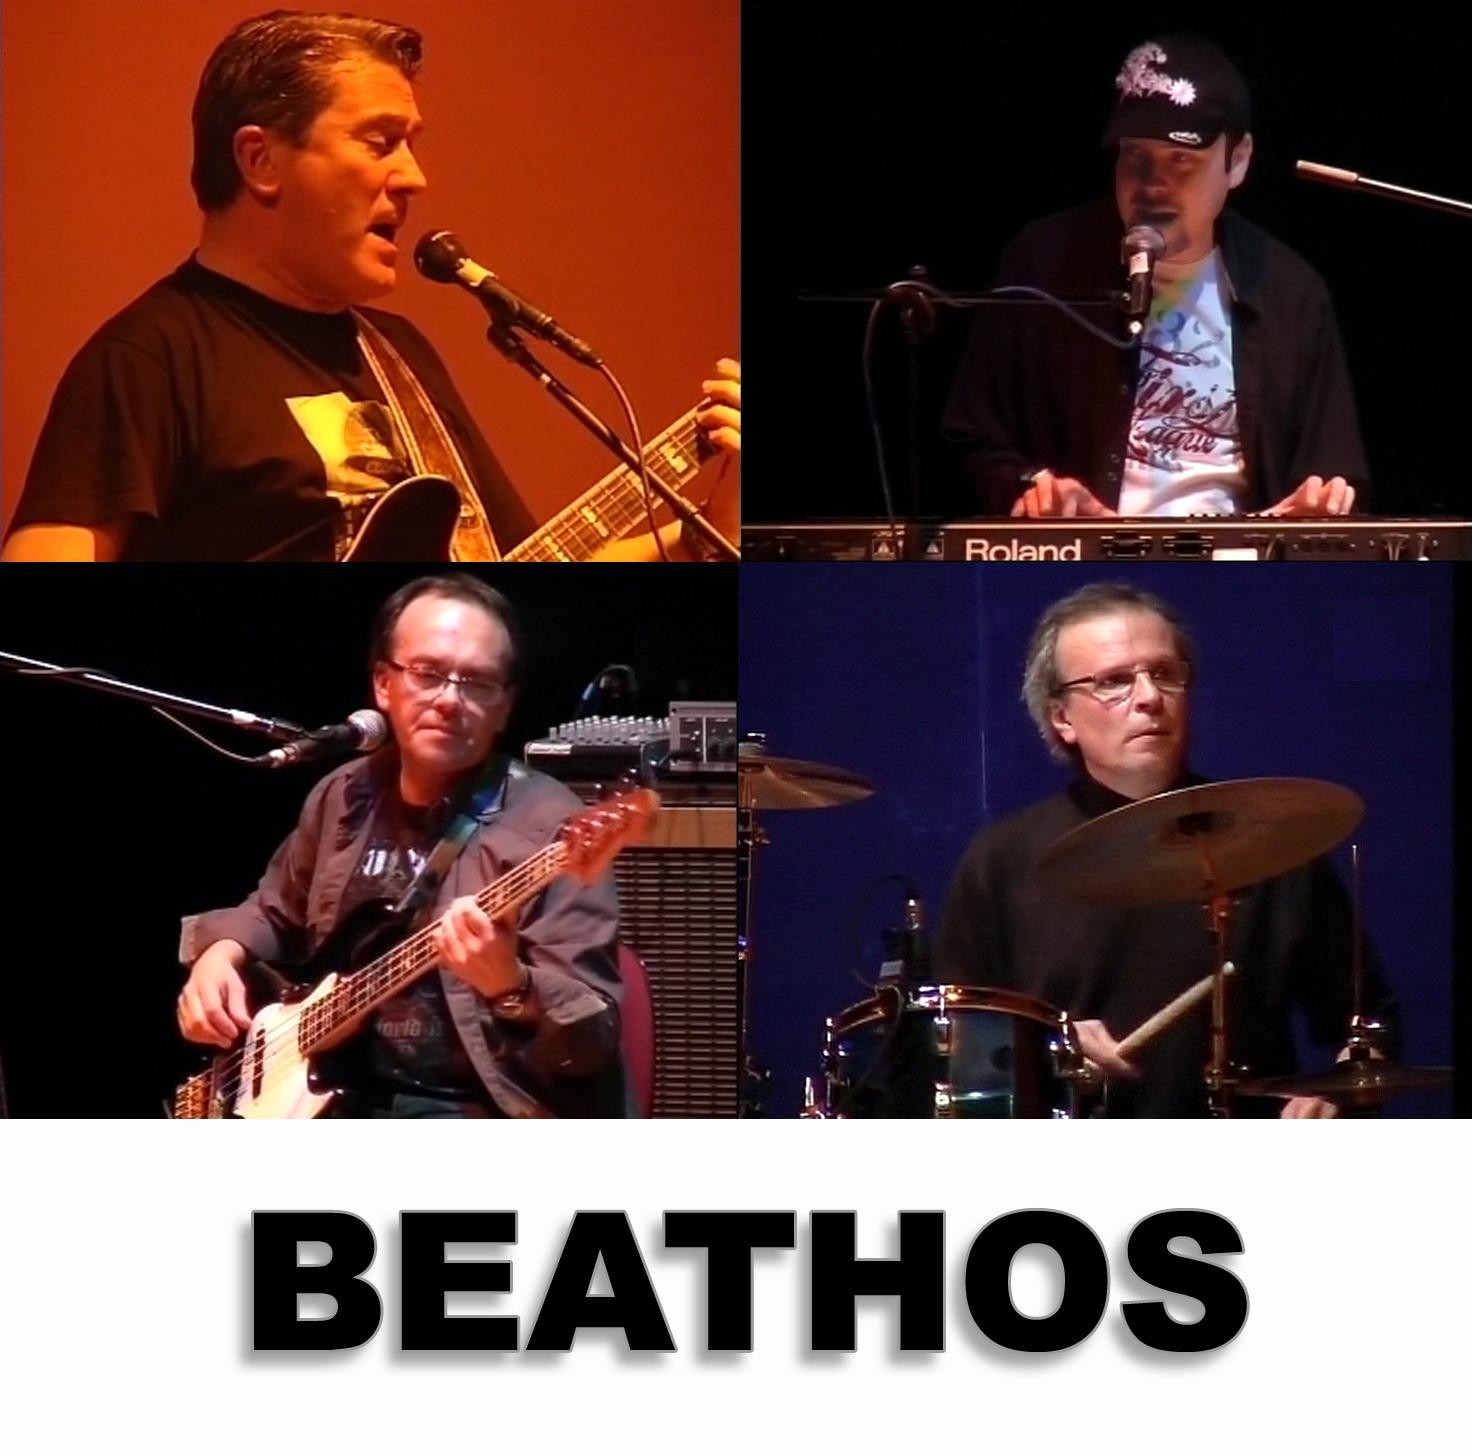 BEATHOS POSTER 2011 color